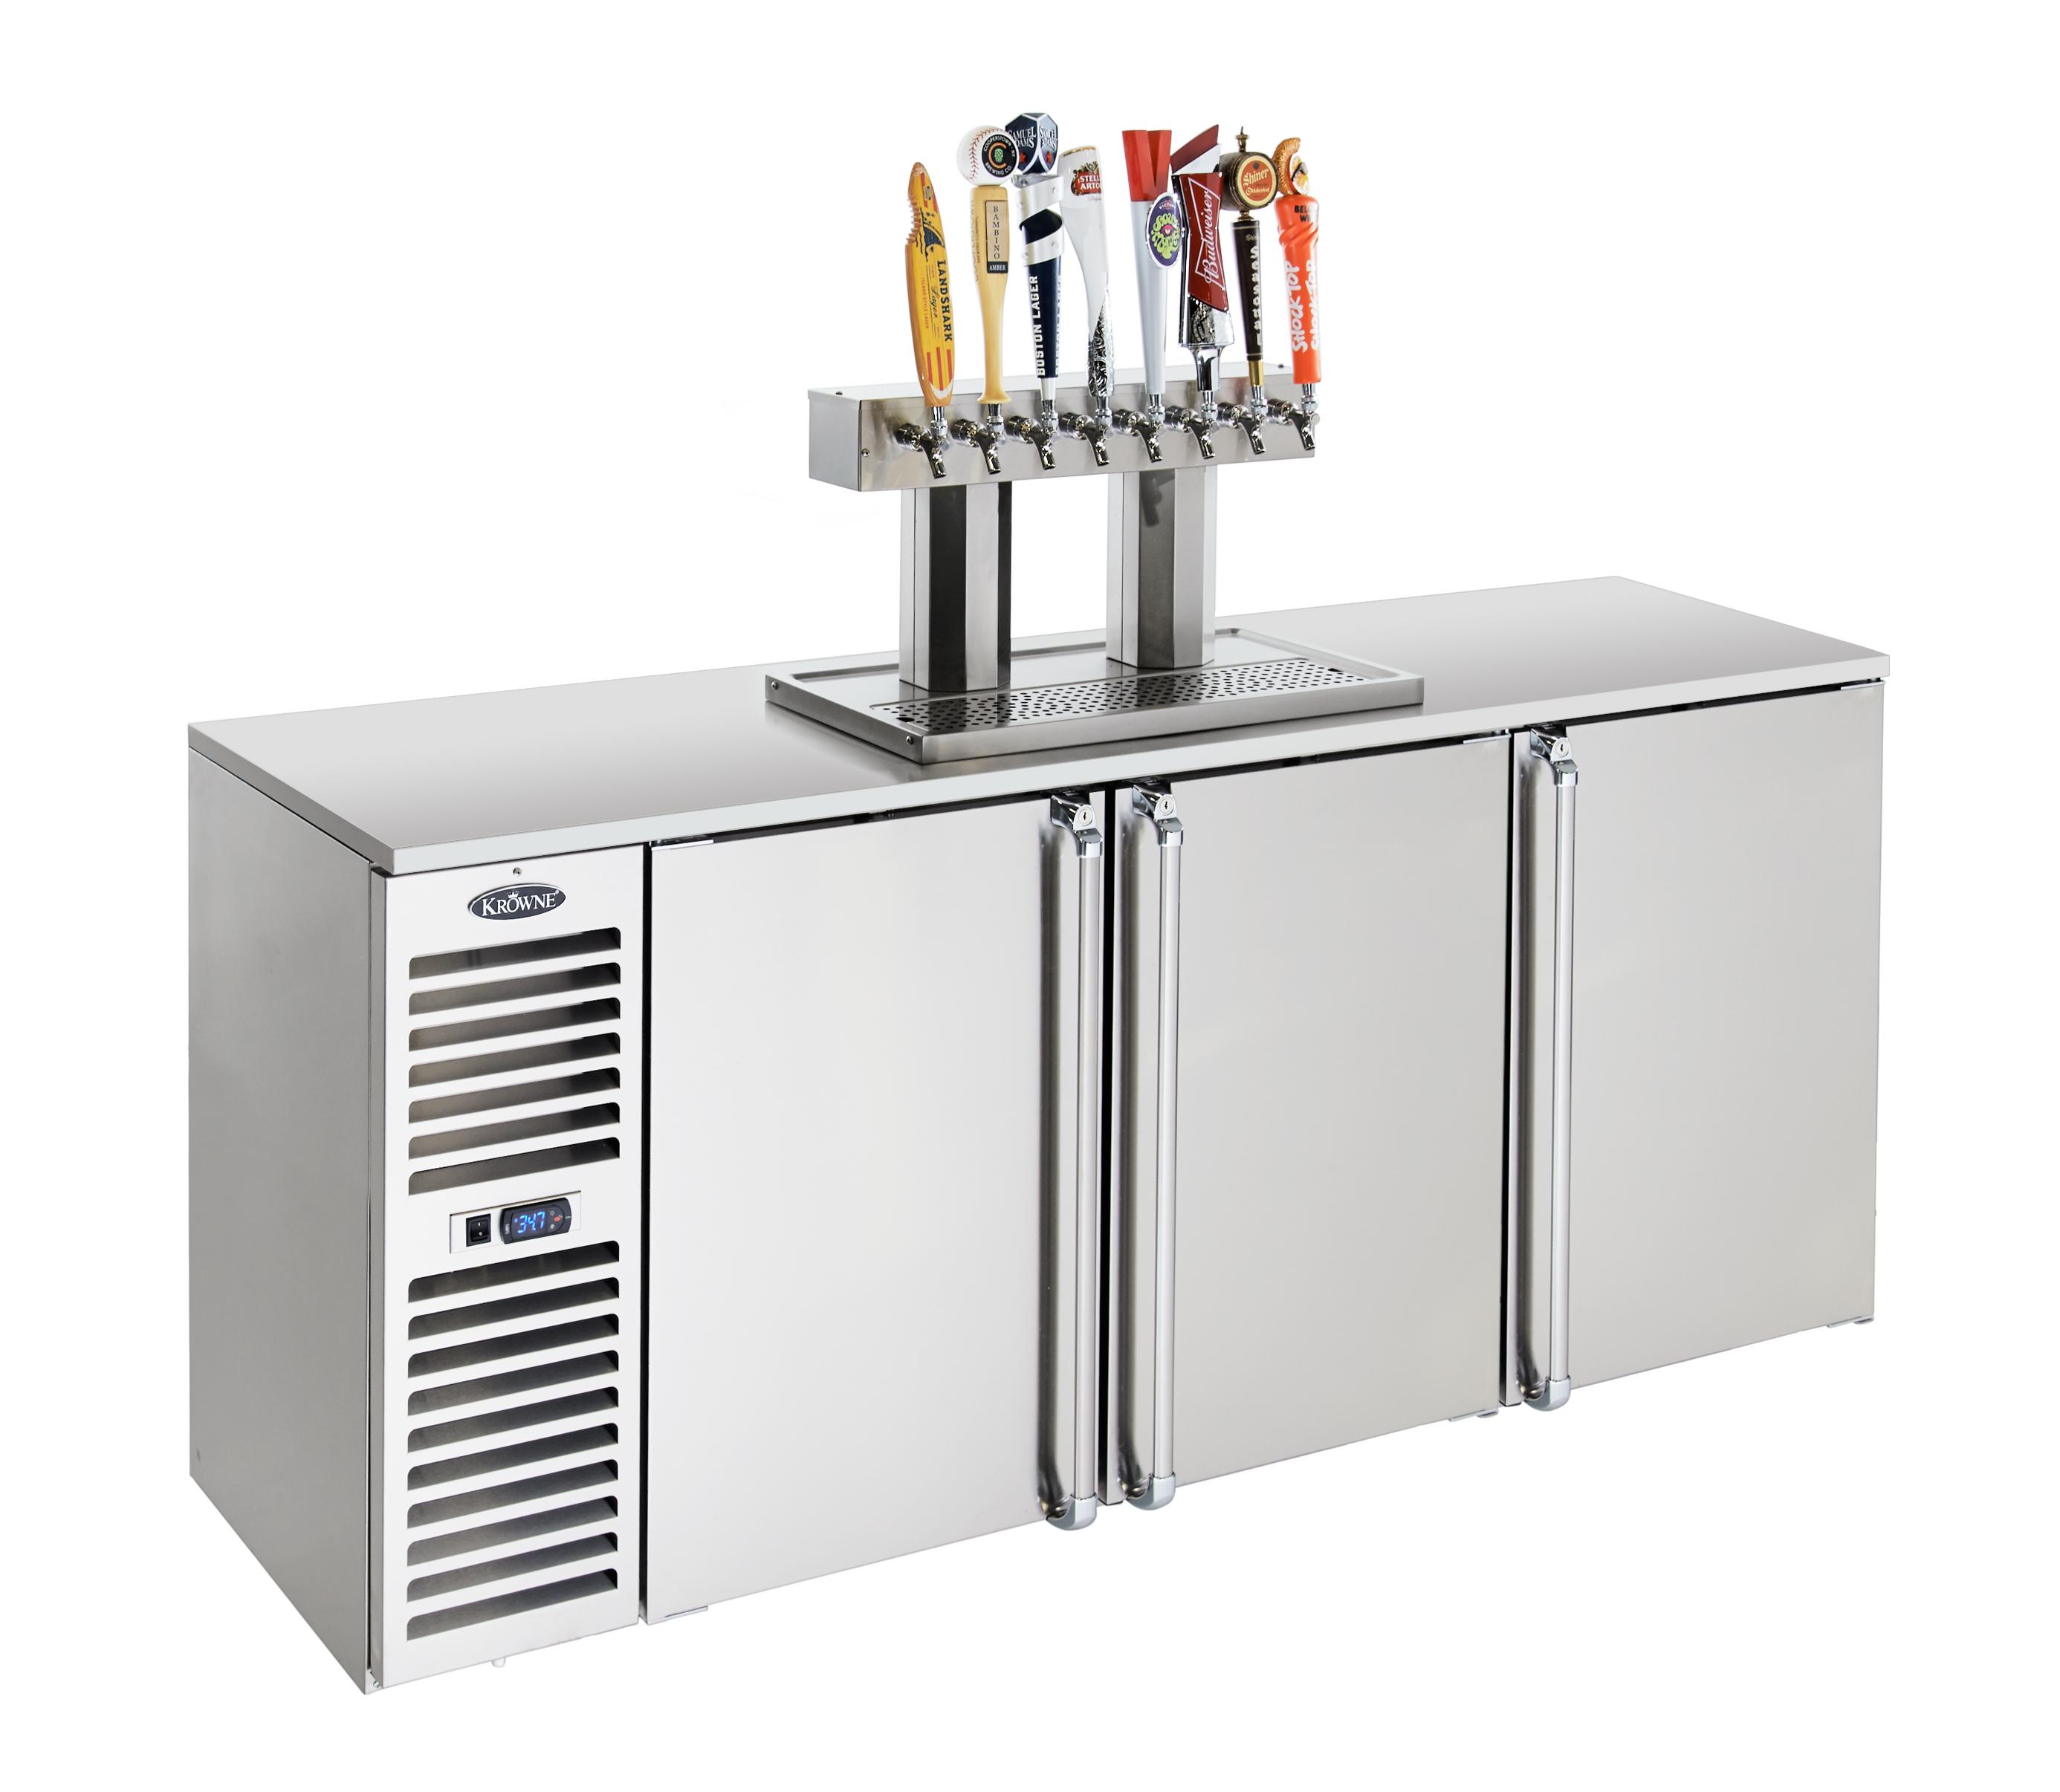 Krowne Metal DB72L-BSS-LR draft beer cooler